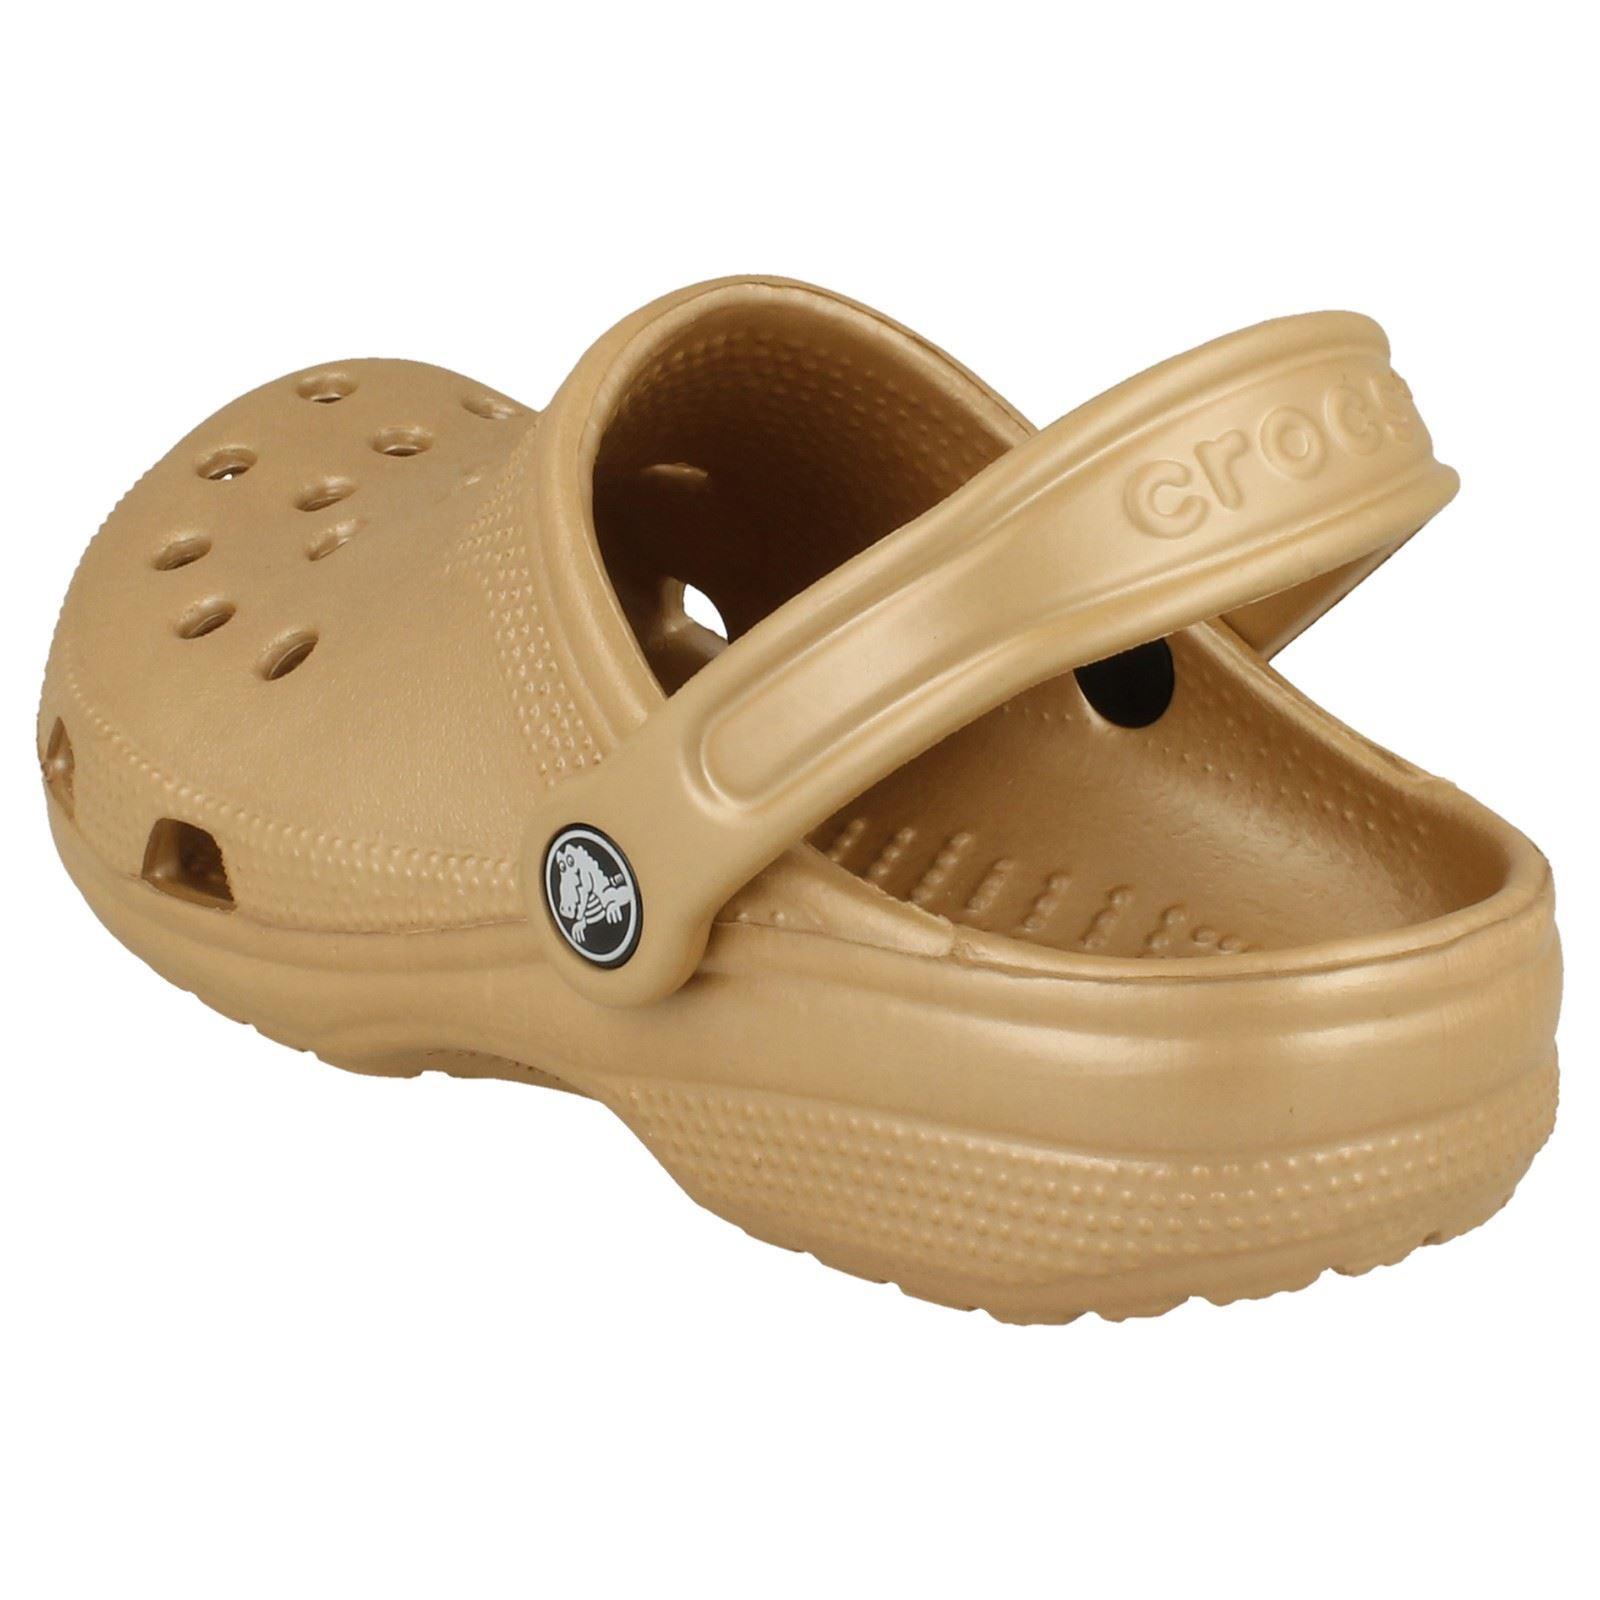 Unisex Ladies /& Mens Slip On Synthetic Crocs Summer Sandals Beach